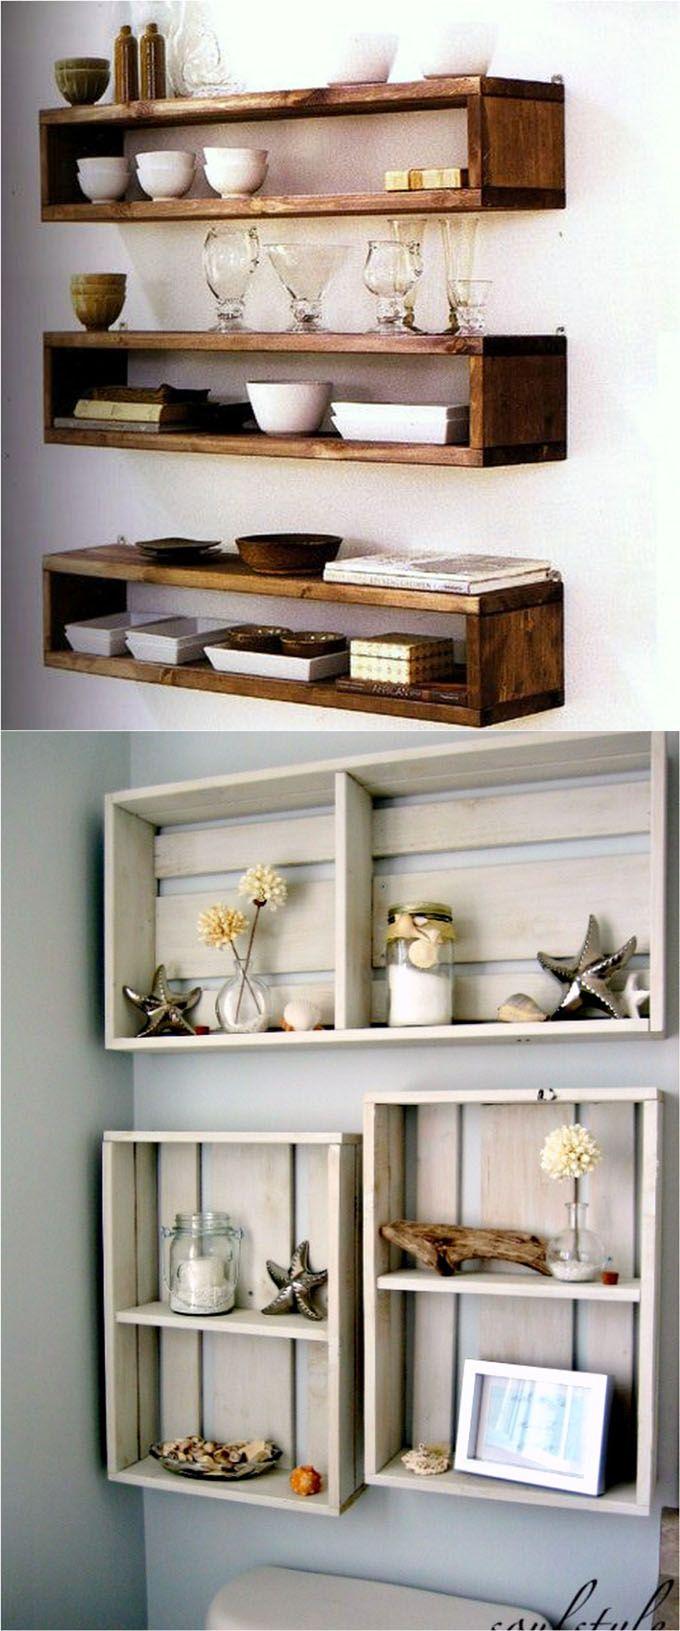 Wooden shelves tree tree branch bookshelf diy tree shaped shelf - 16 Easy And Stylish Diy Floating Shelves Wall Shelves